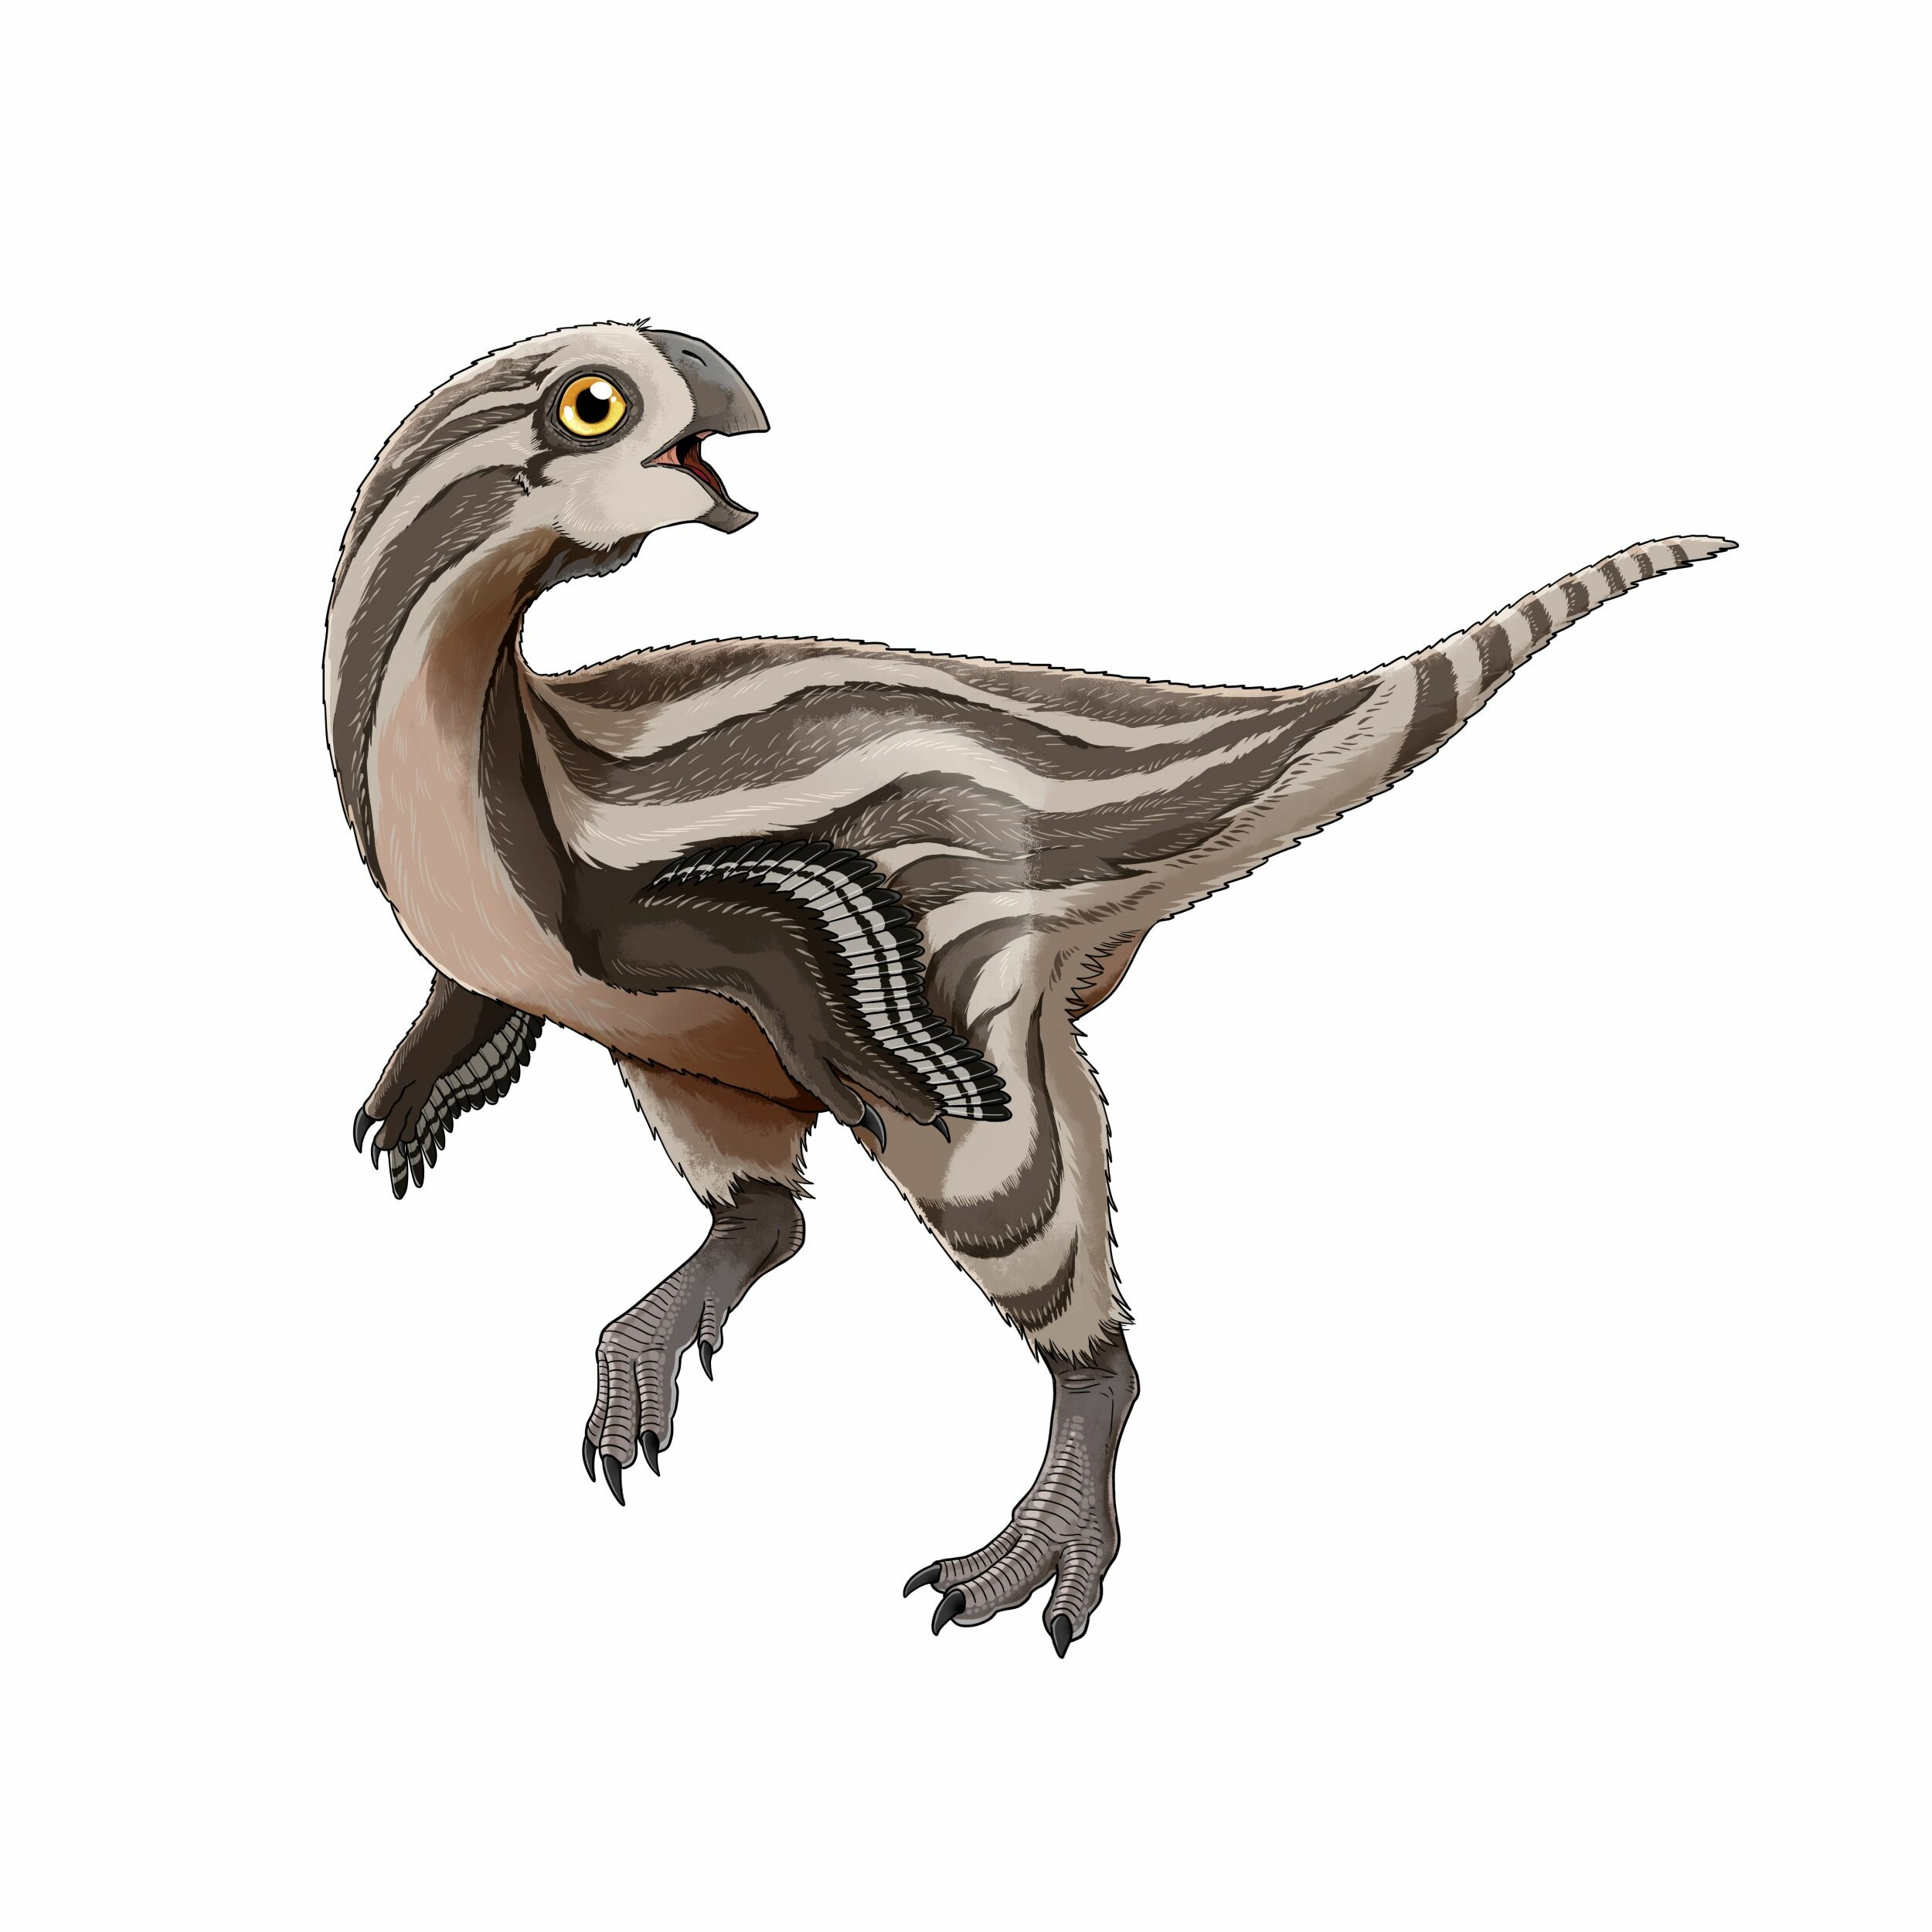 [Image: newoviraptor.jpg]